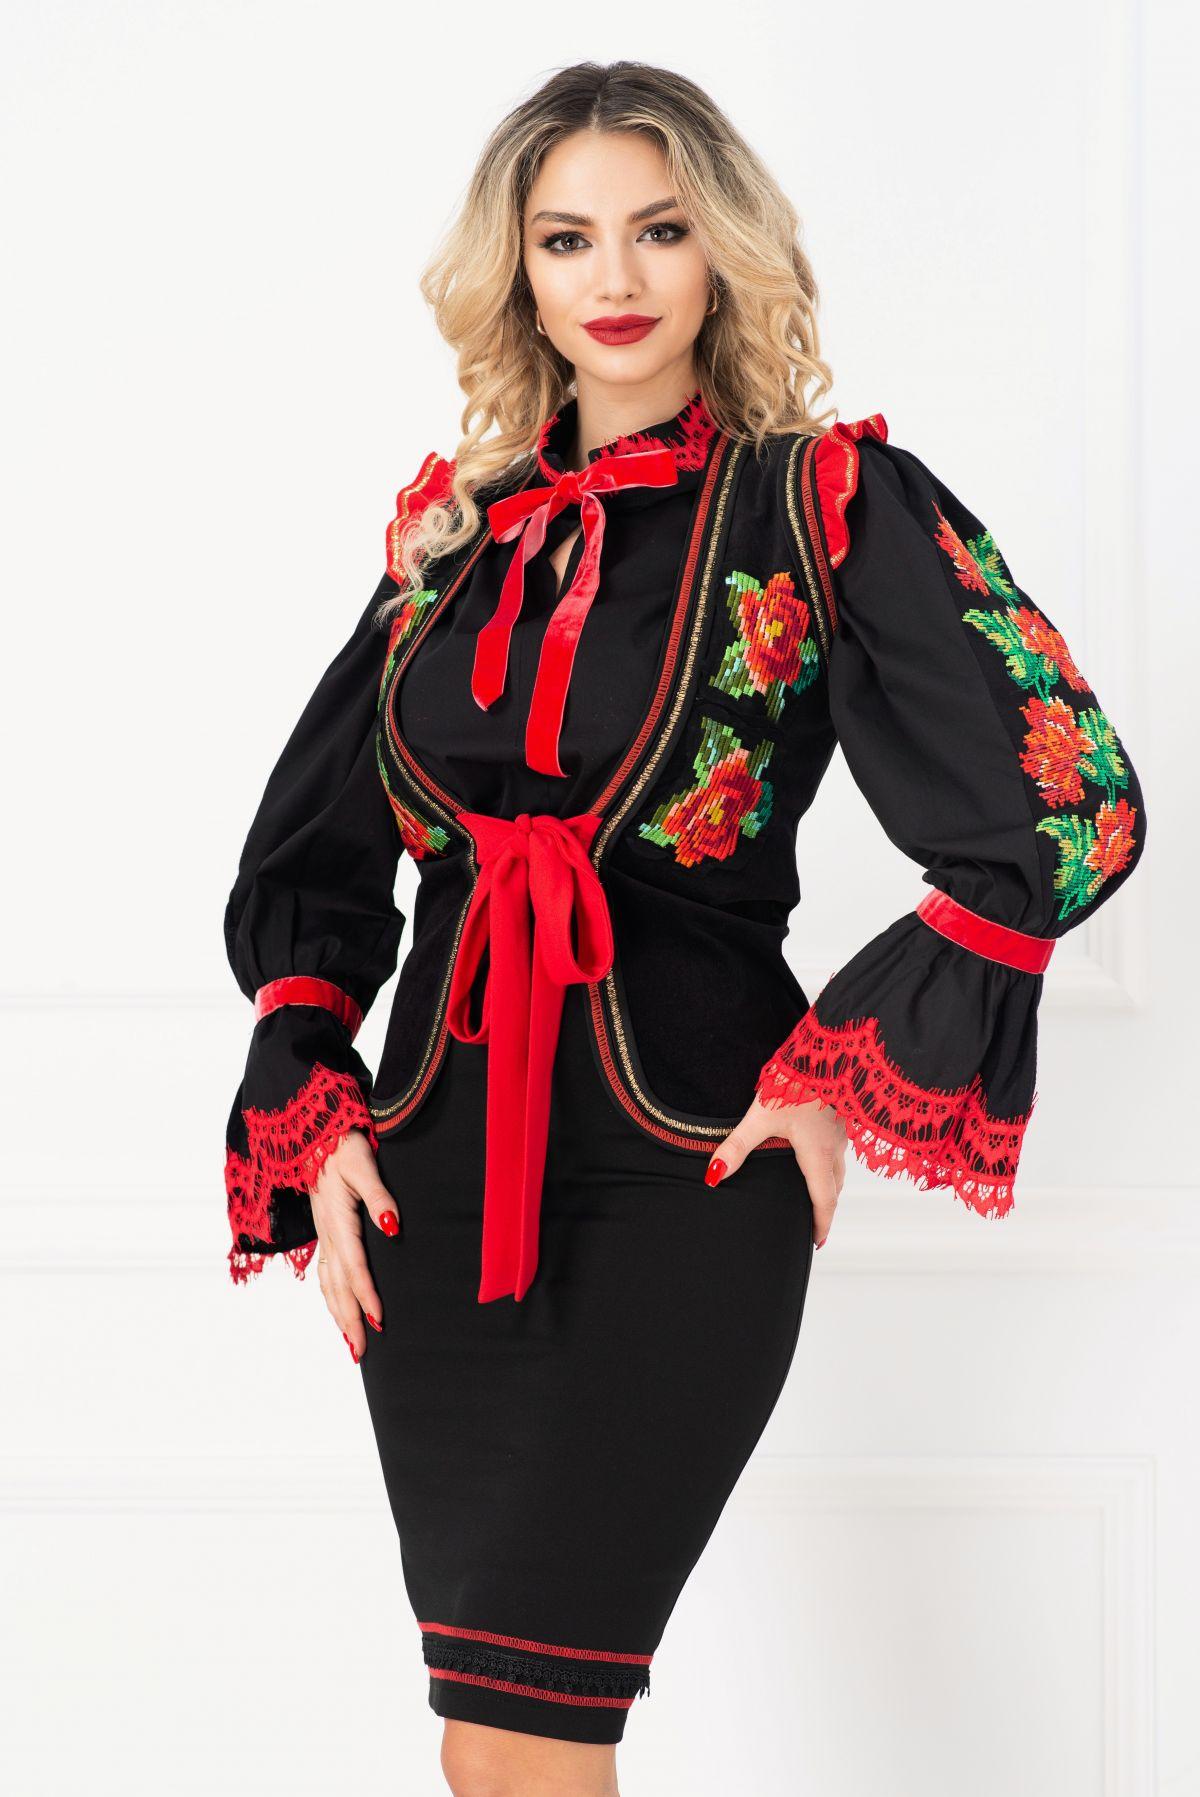 Vesta traditionala brodata cu volanase rosii la umeri